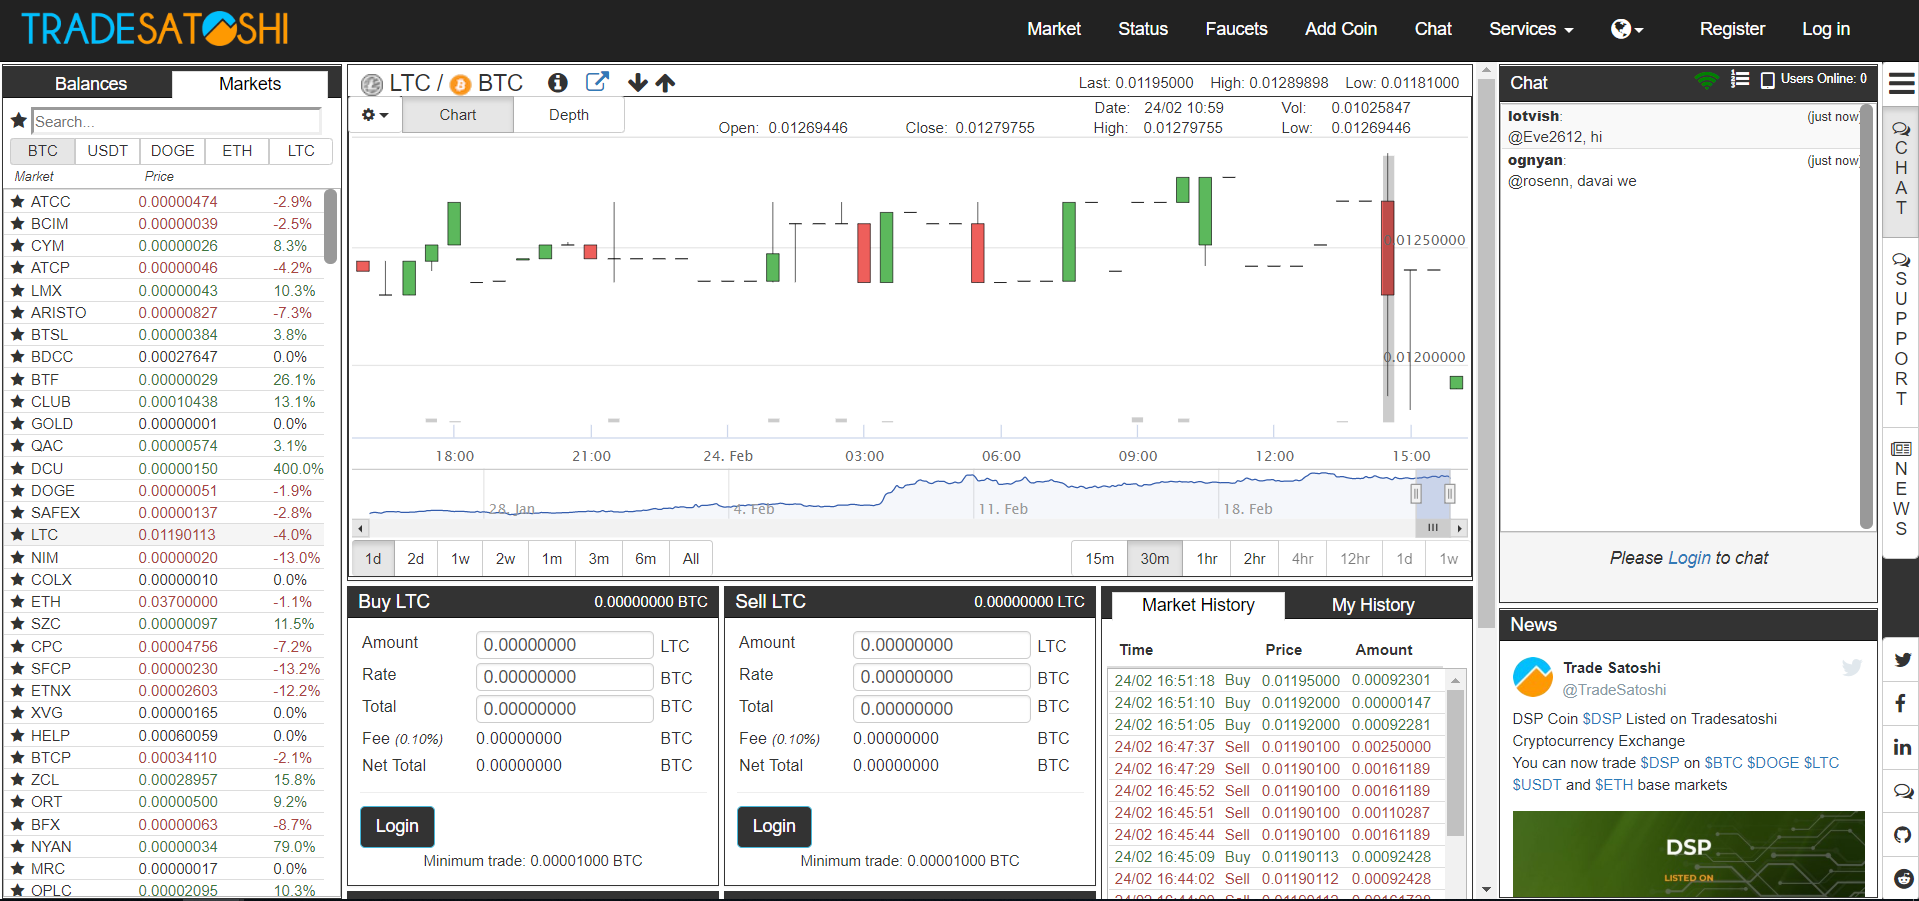 Trade Satoshi Trading View